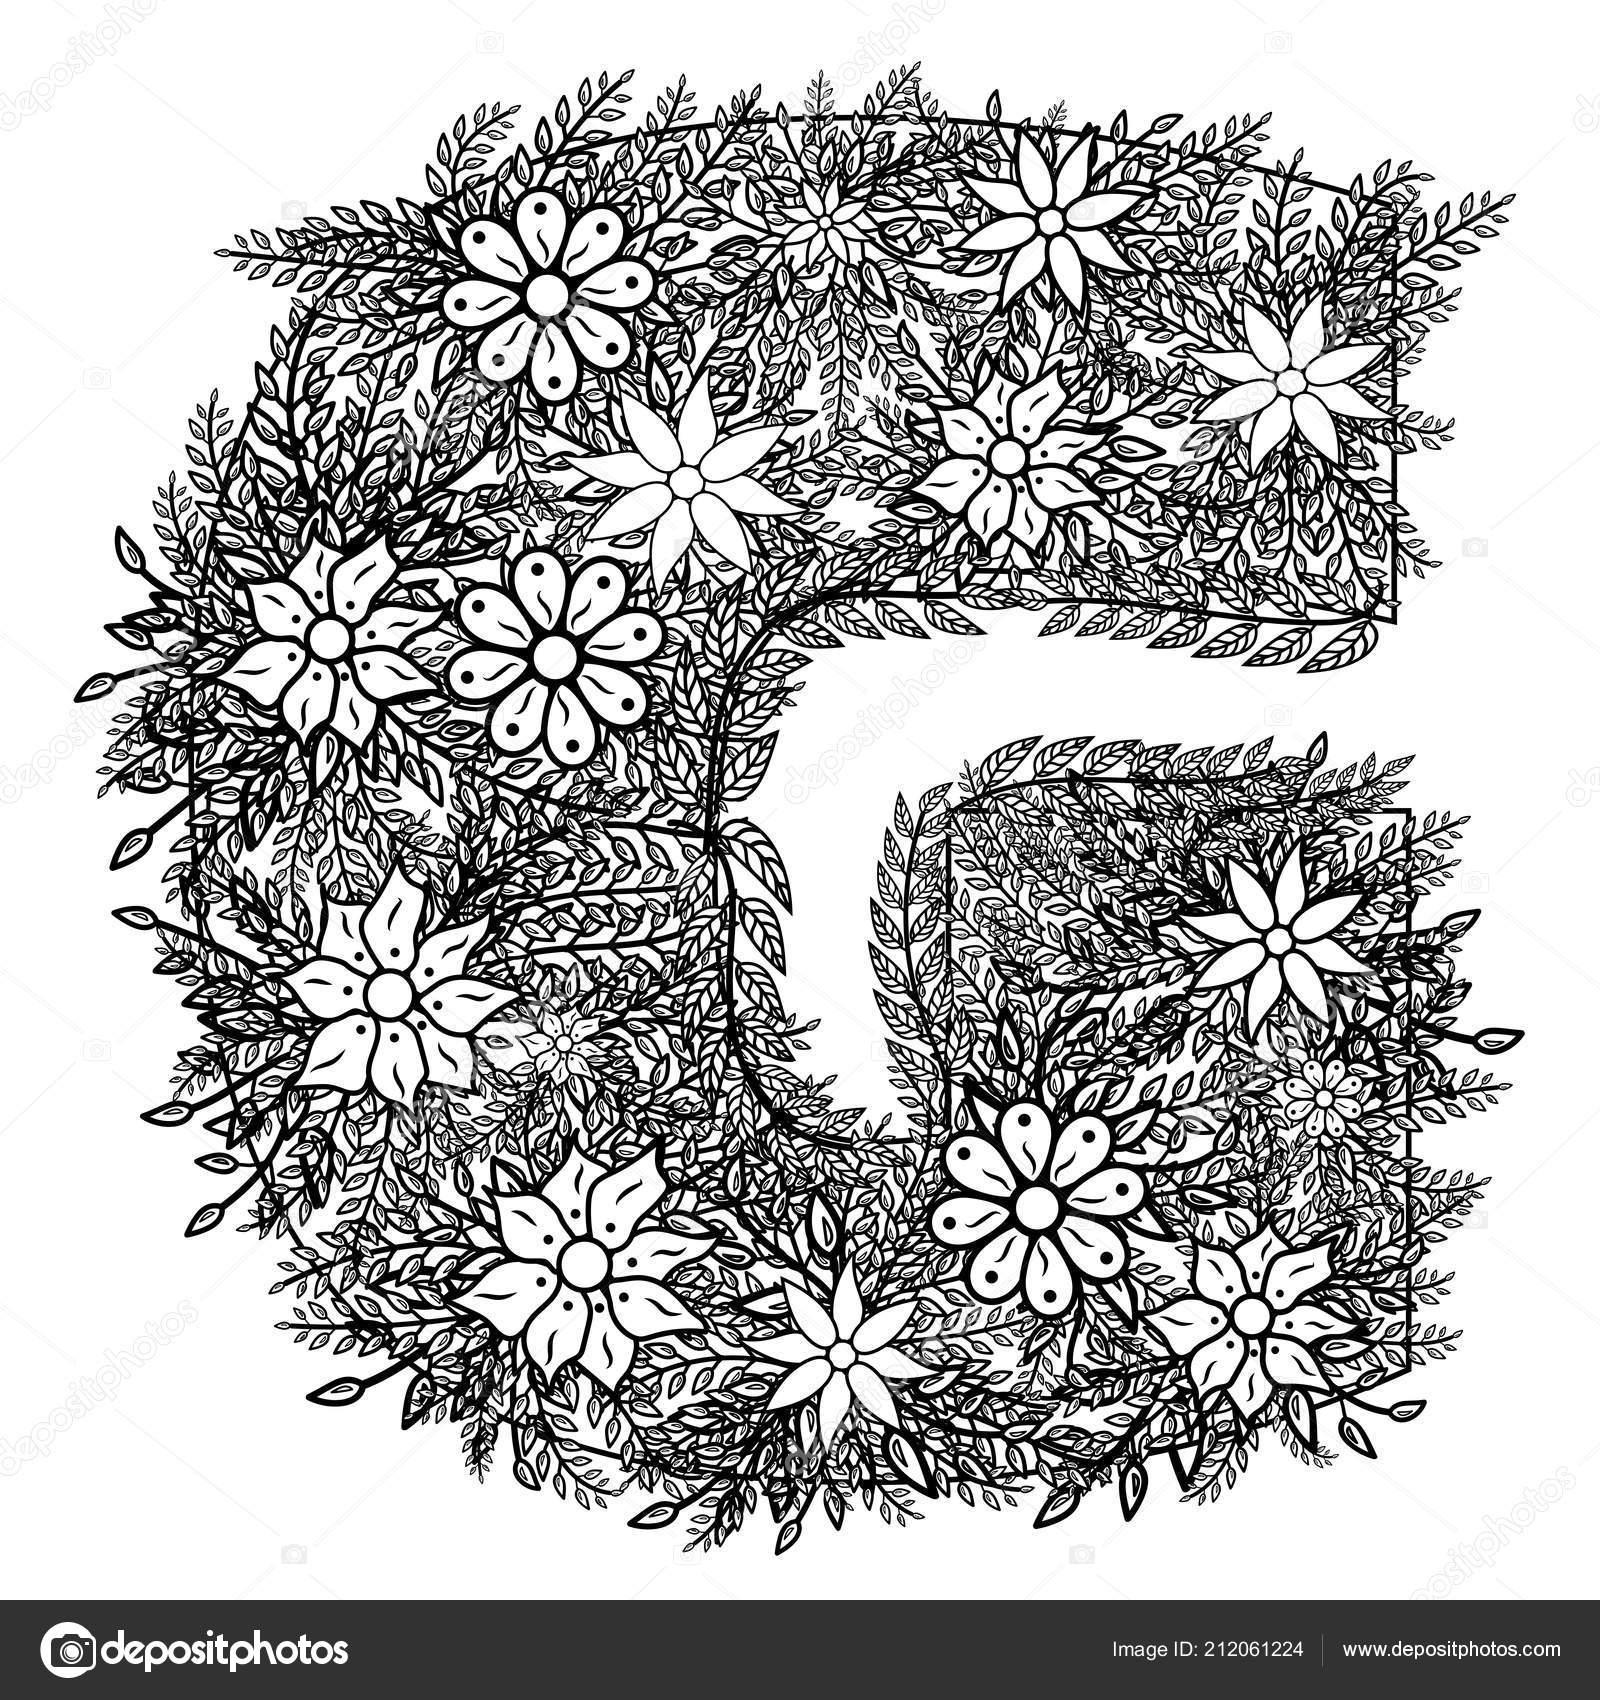 Lettre Dudling Dessin Mandala Alphabet Dans Style Dudling